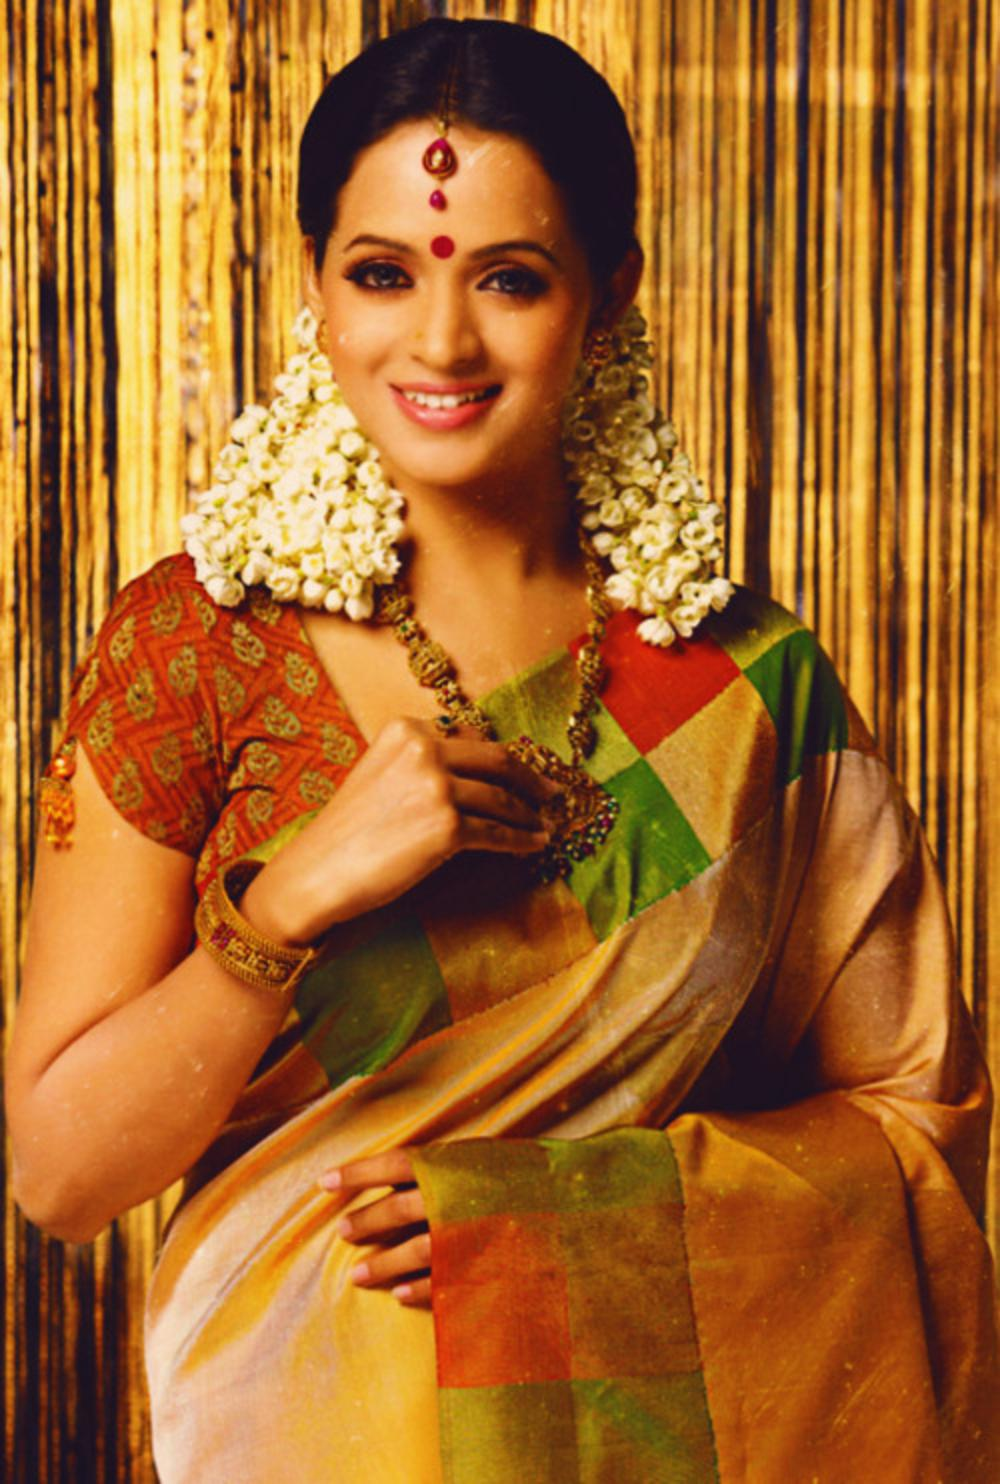 Hot South Indian Actress Bridal Sarees - Trionic 88 Tube Sex-7668